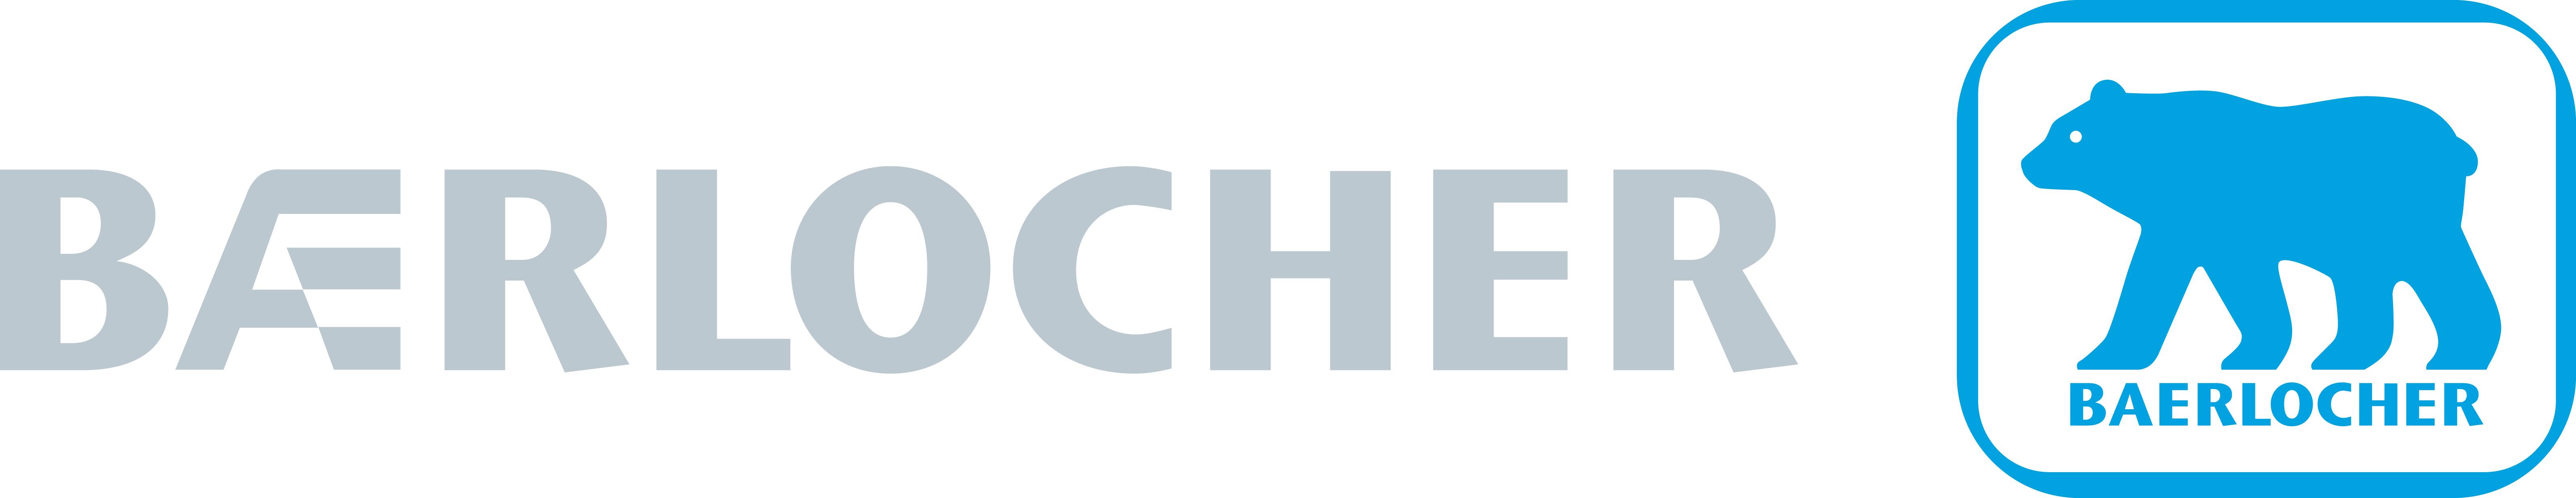 Baerlocher GmbH